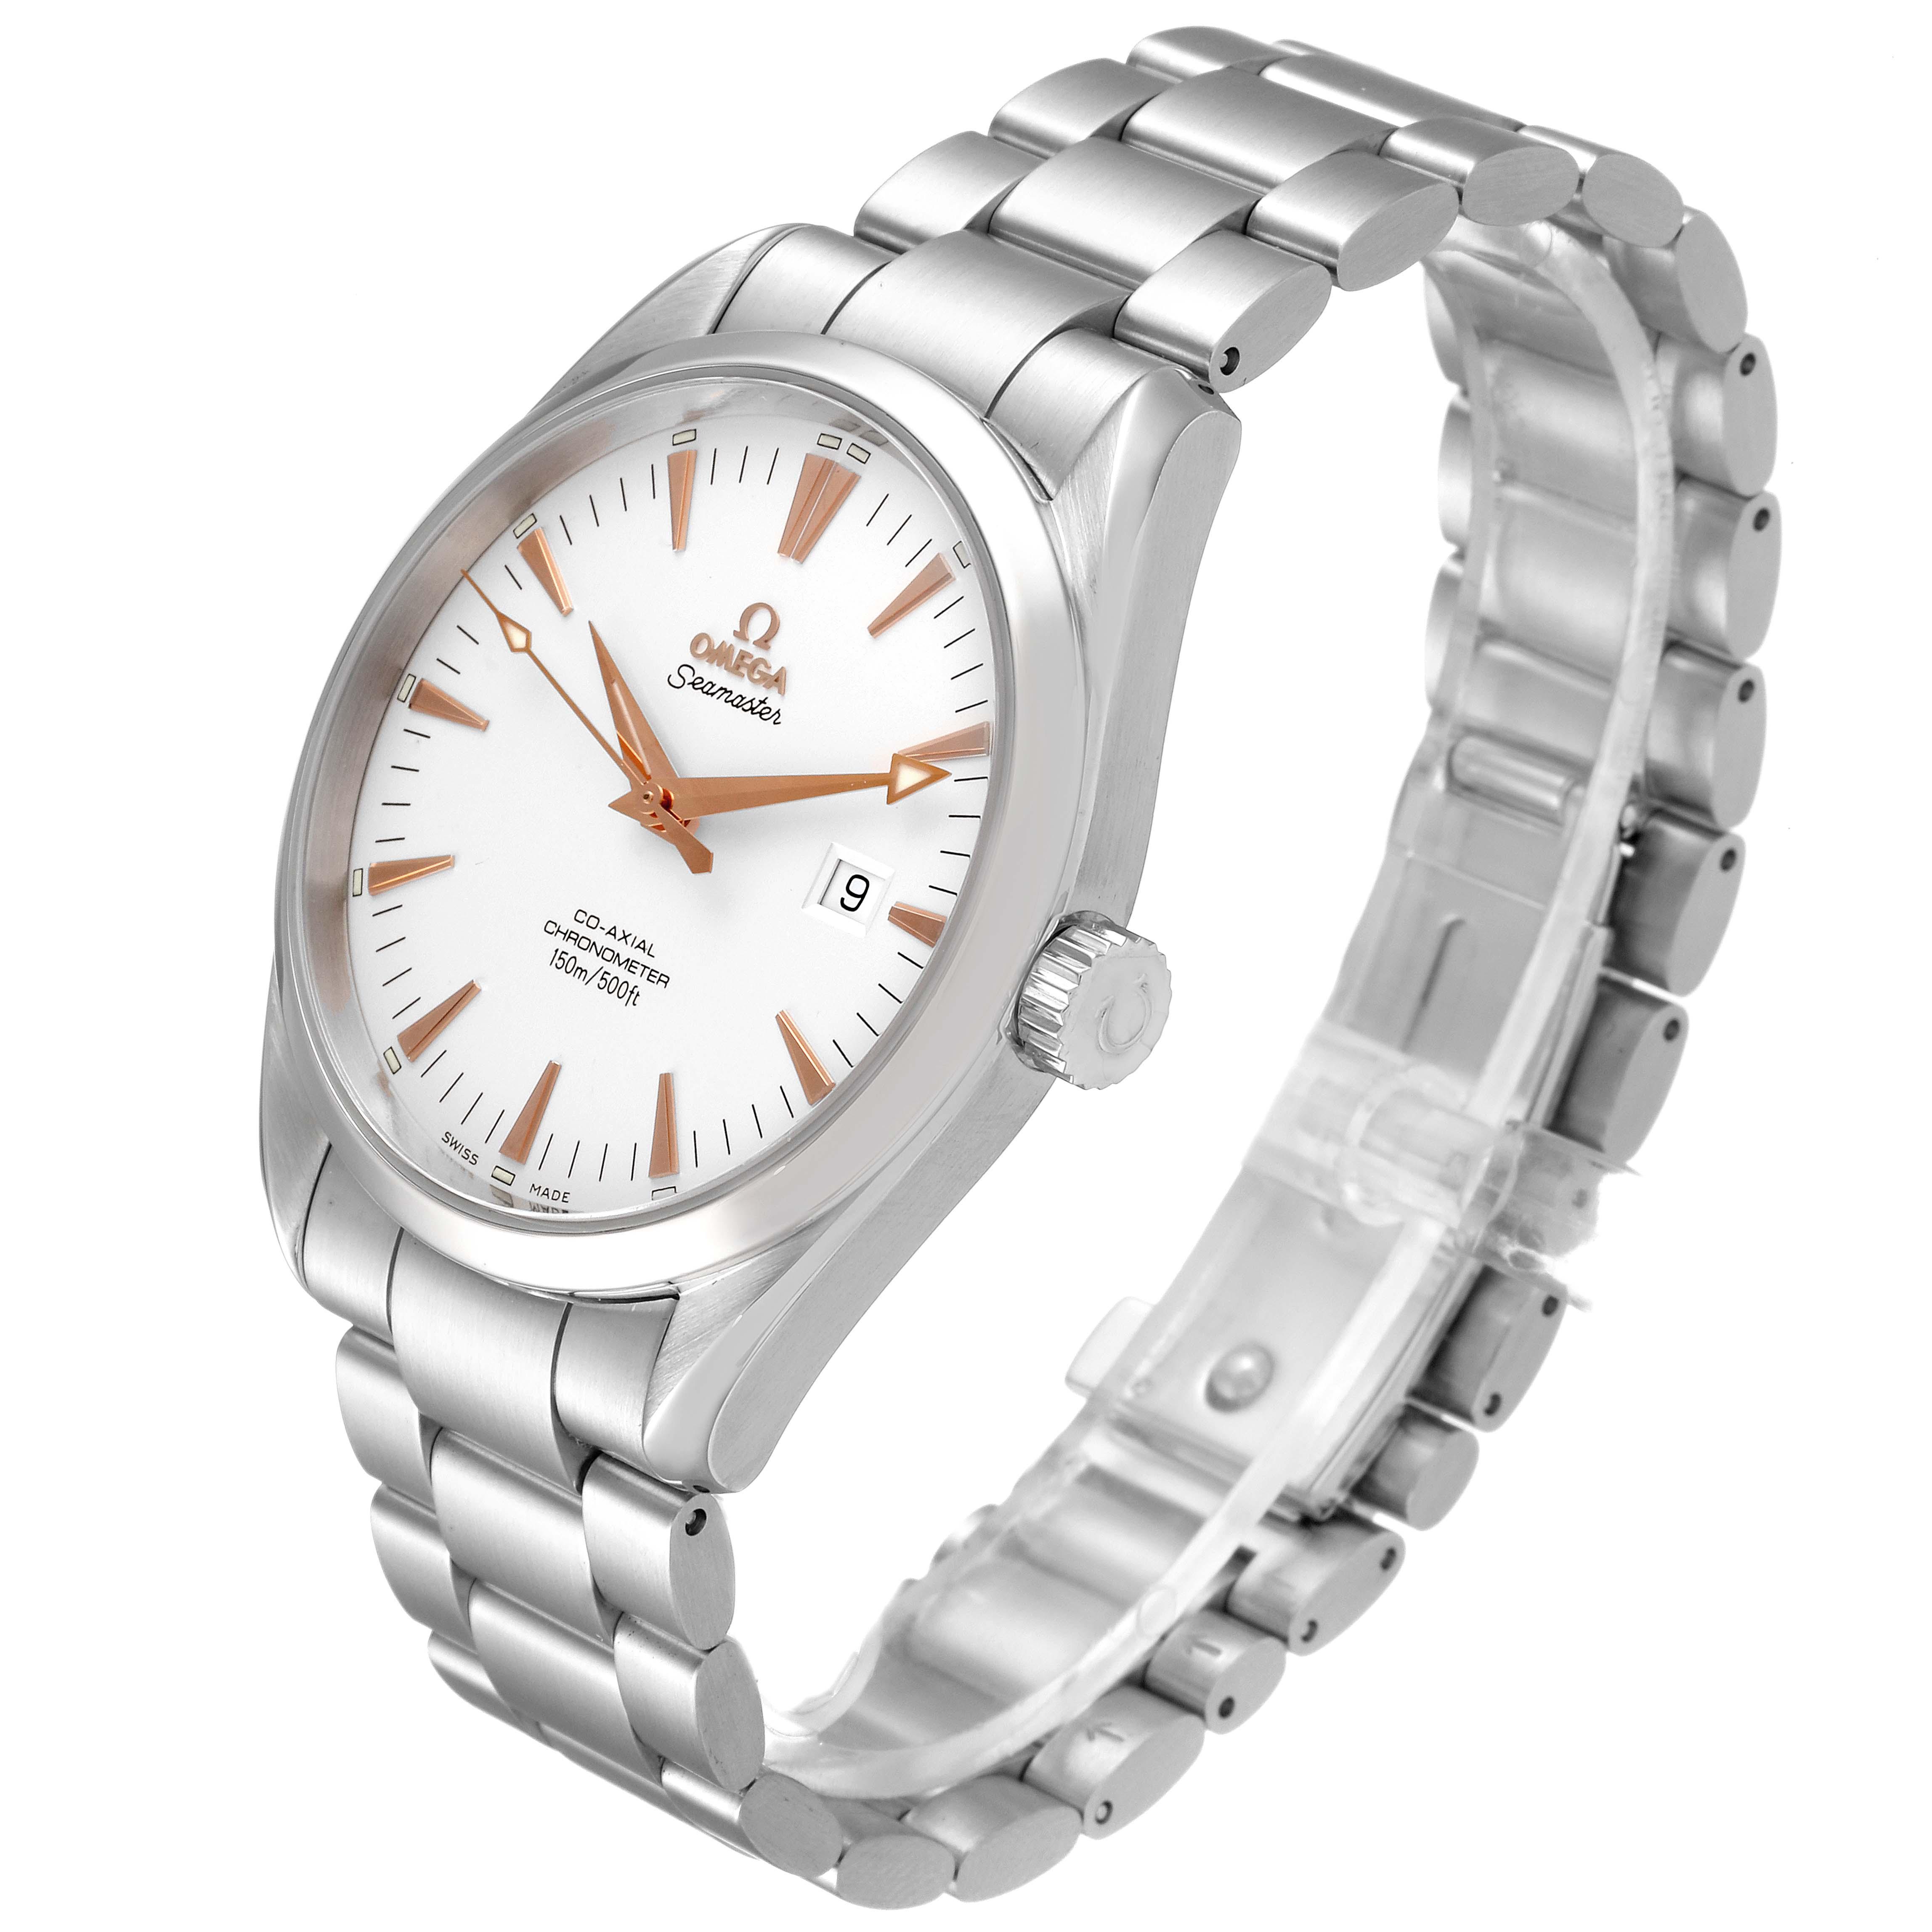 Omega Seamaster Aqua Terra Silver Dial Steel Mens Watch 2502.34.00 SwissWatchExpo